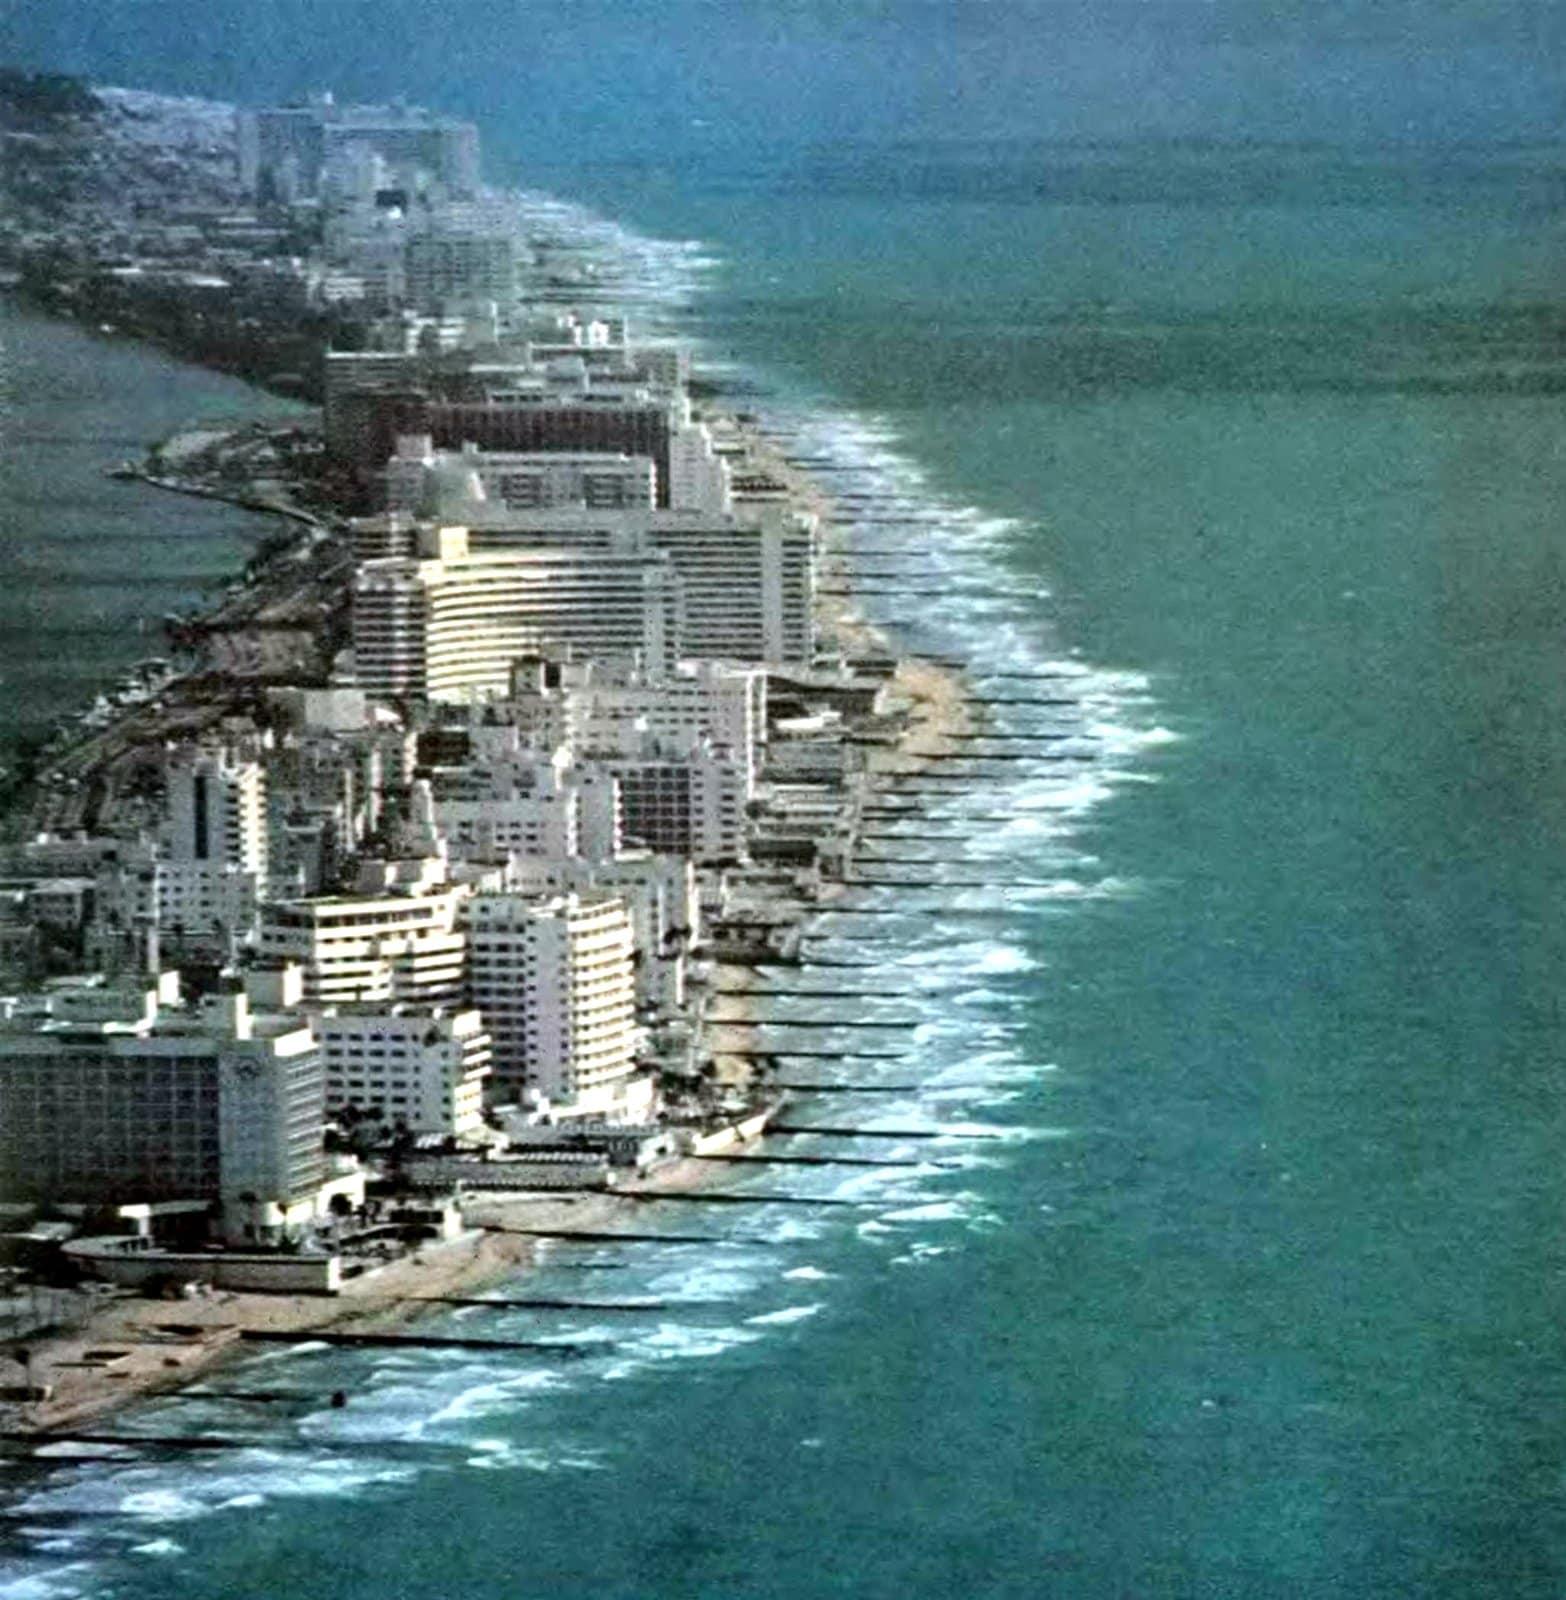 Old Miami Florida in 1967